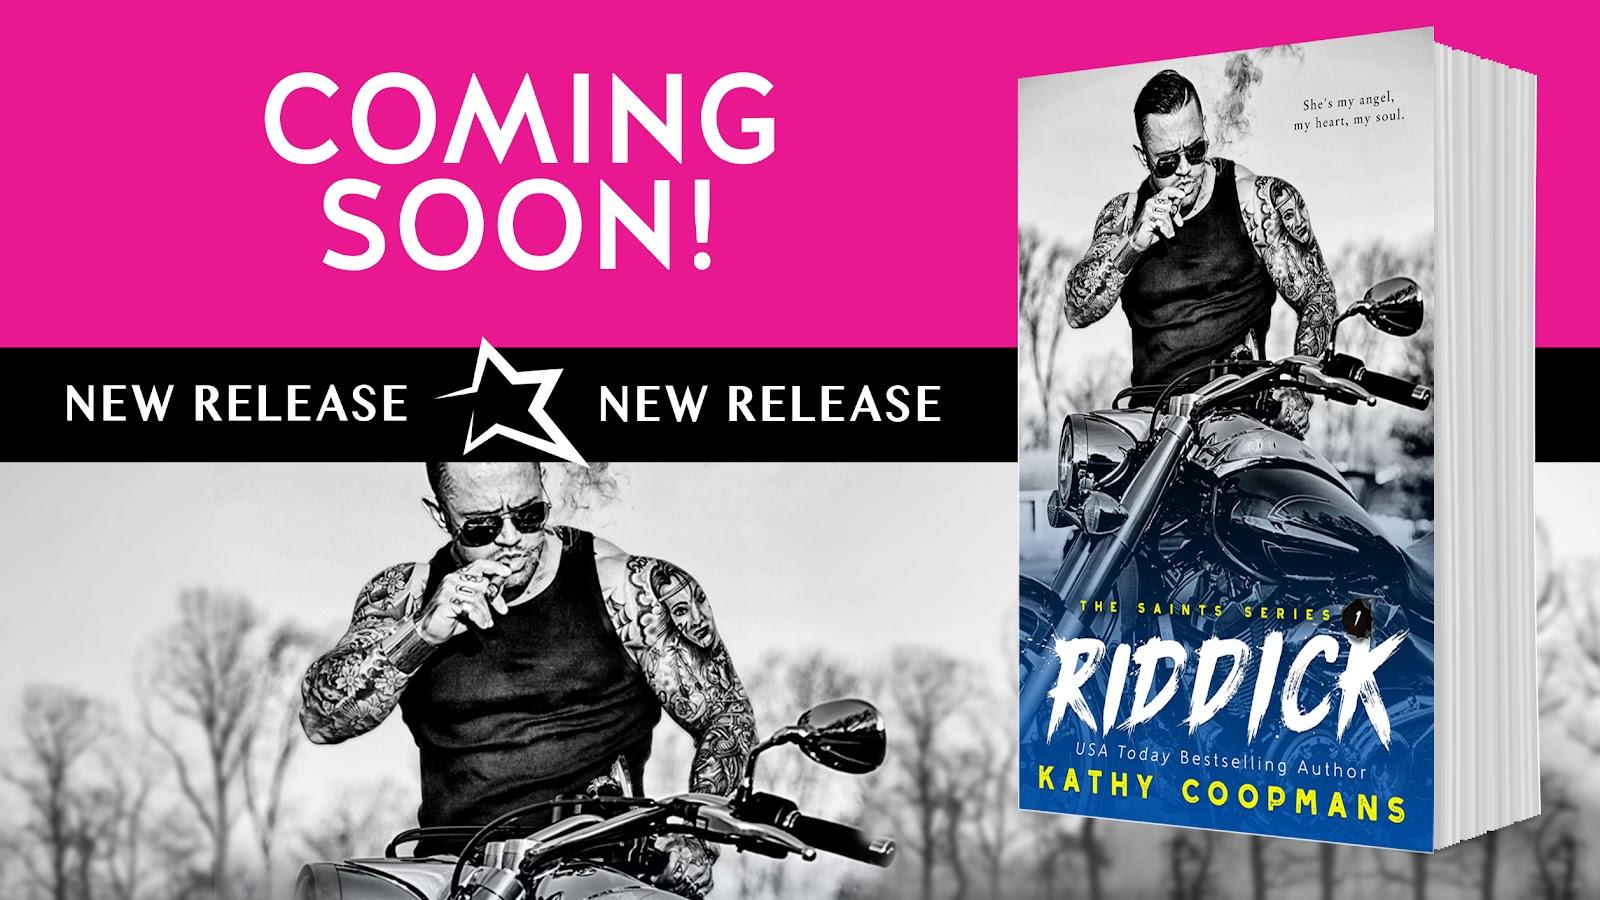 RIDDICK_COMING_SOON.jpg